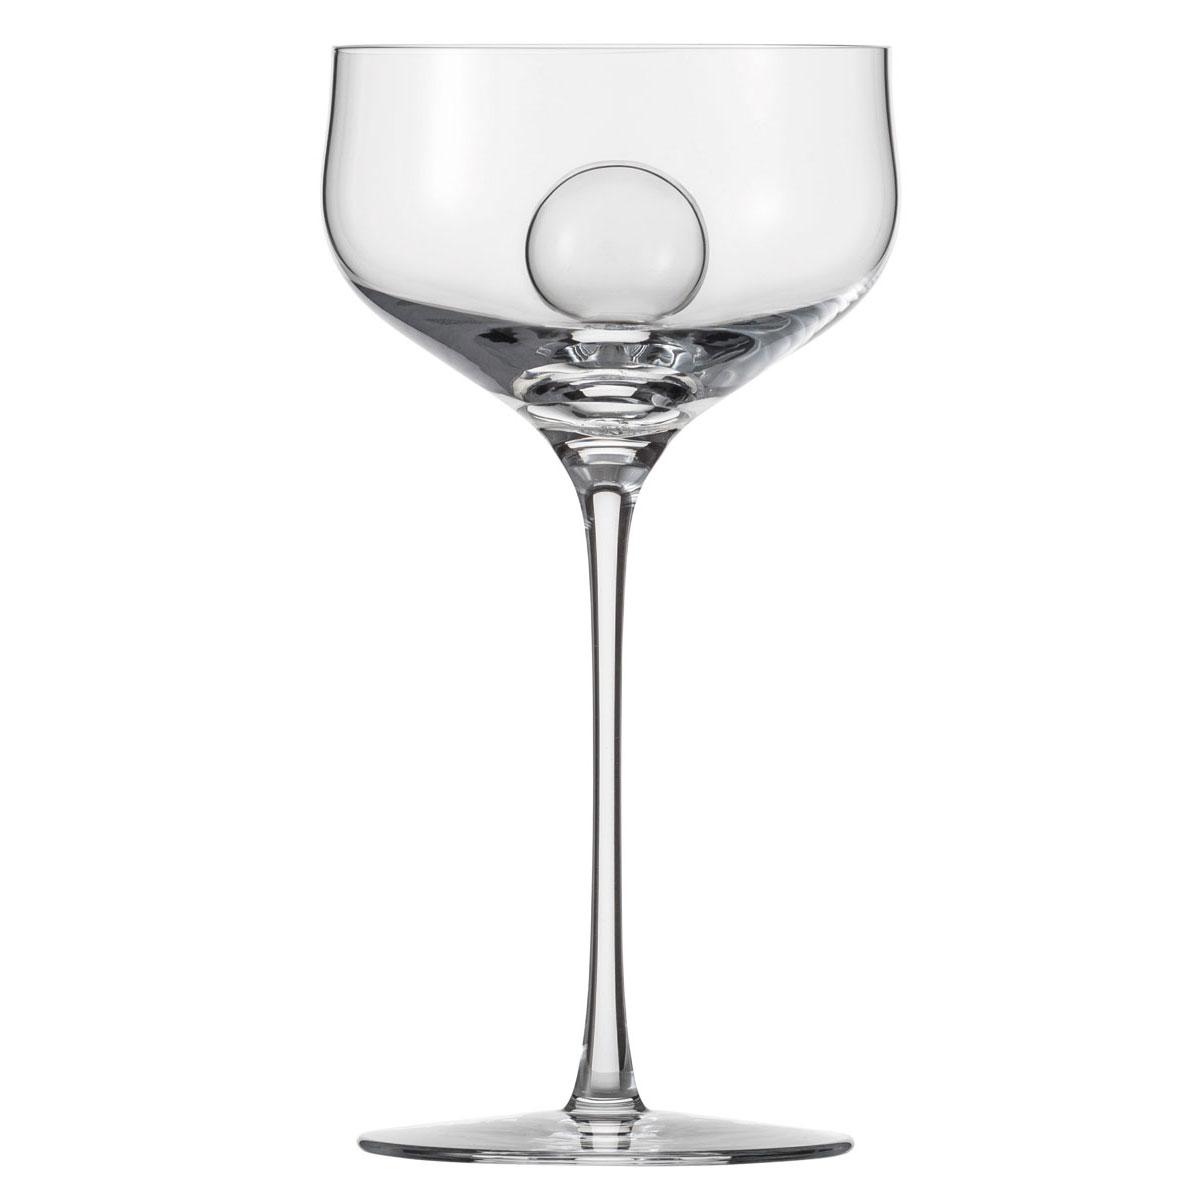 Schott Zwiesel Tritan Crystal, 1872 Air Sense Dessert Crystal Wine Glass, Single